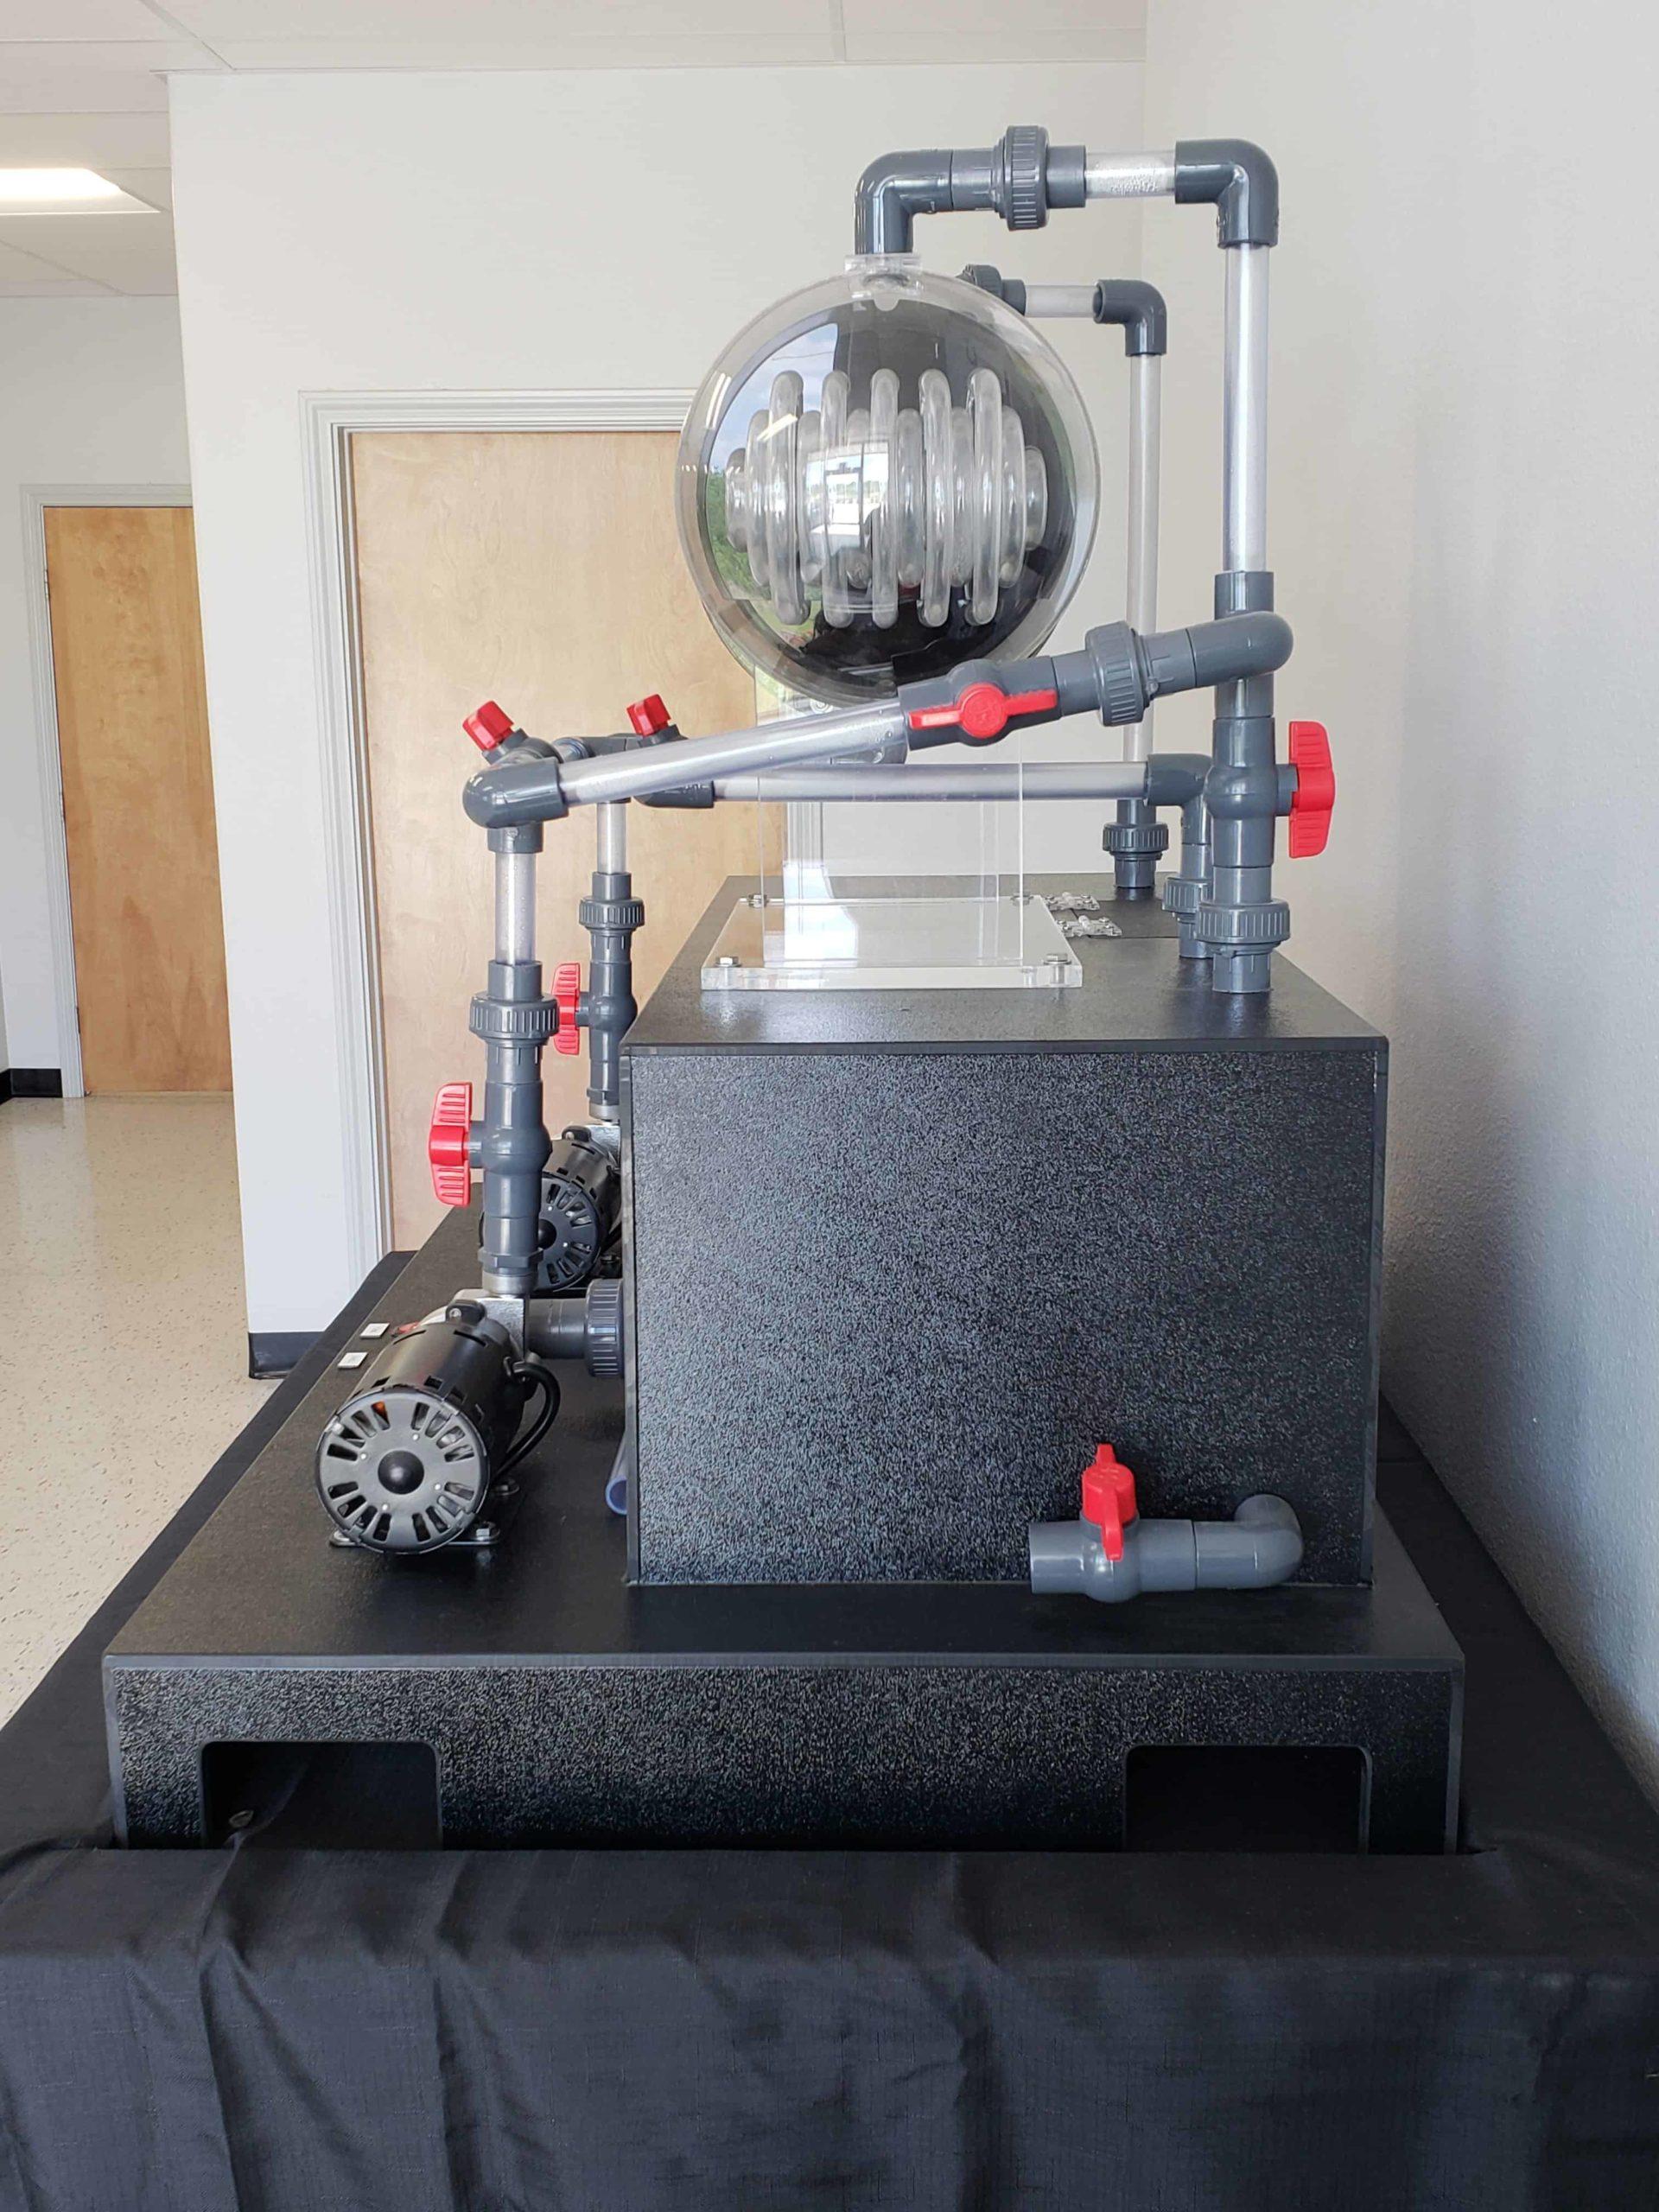 Bayport Technical   U-Tube Heat Exchanger Circulation Trainer with Backwash